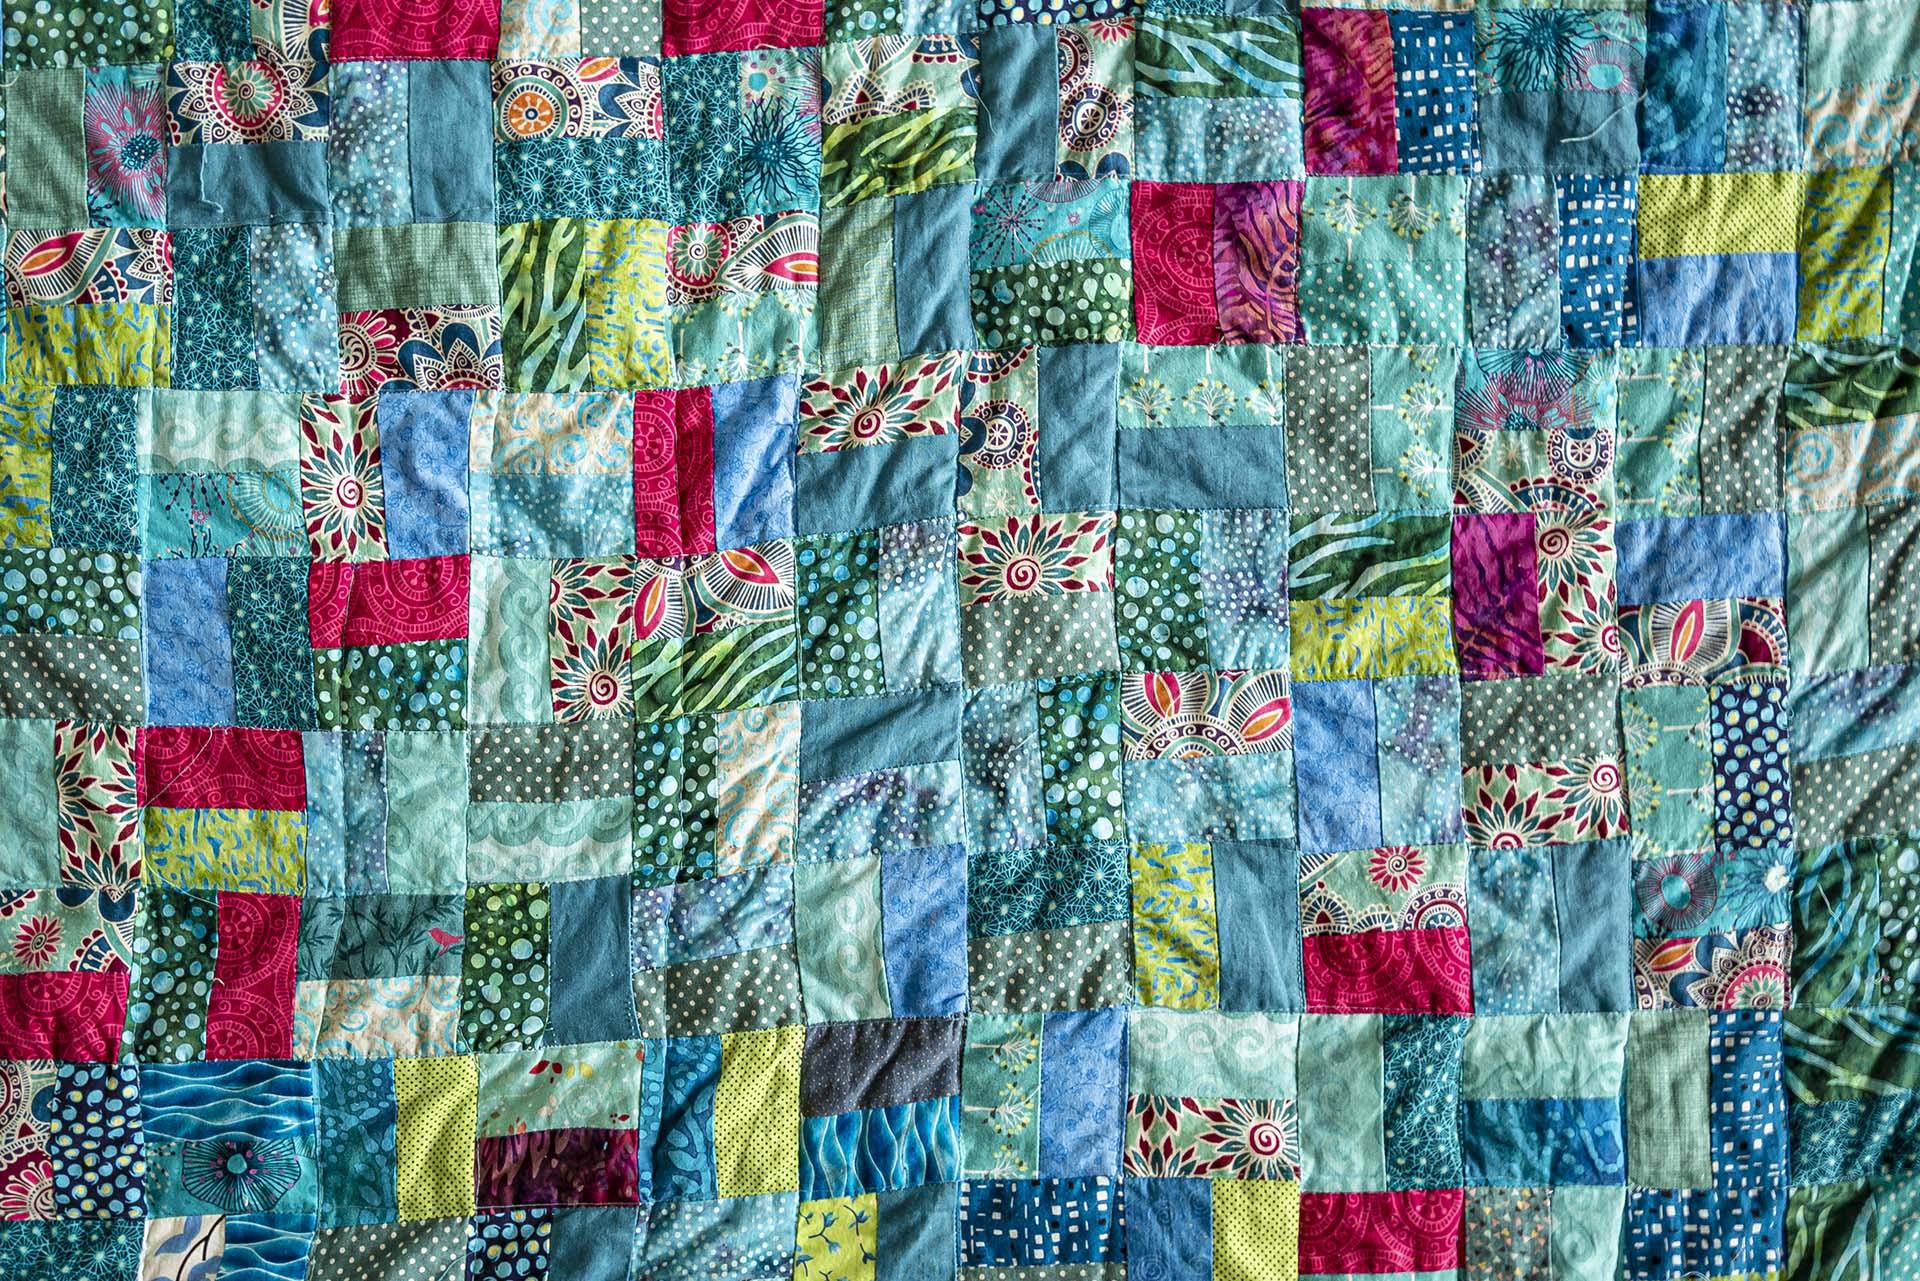 sarah kind quilt 2020 granite worktop supply issues